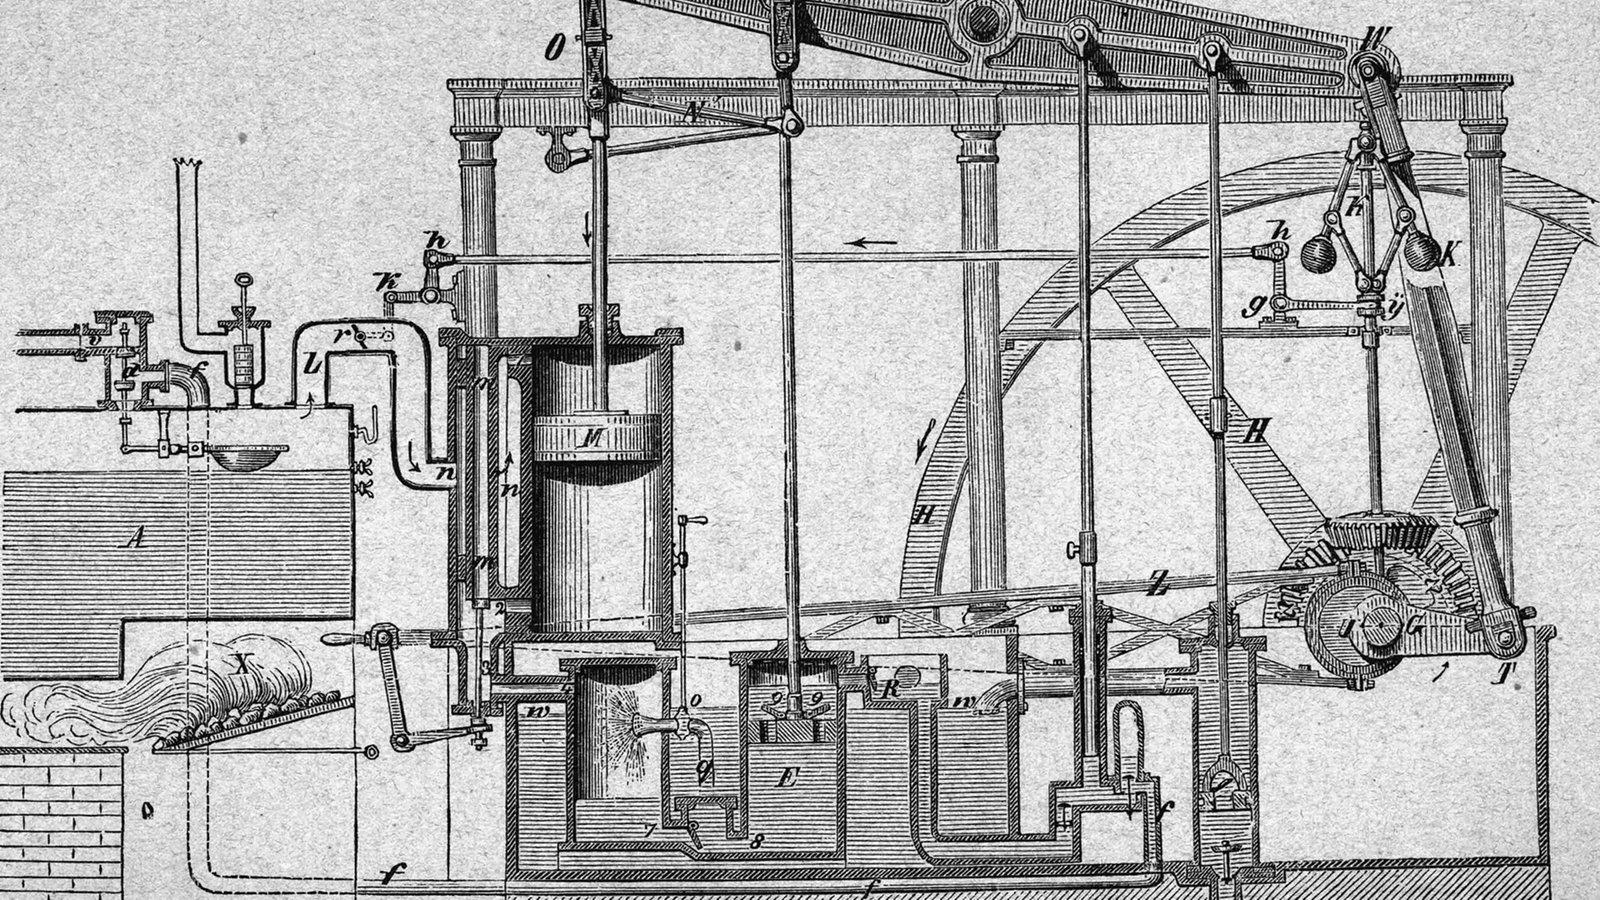 Maschinenbau ingenieure dringend gesucht technik for Master maschinenbau ohne nc